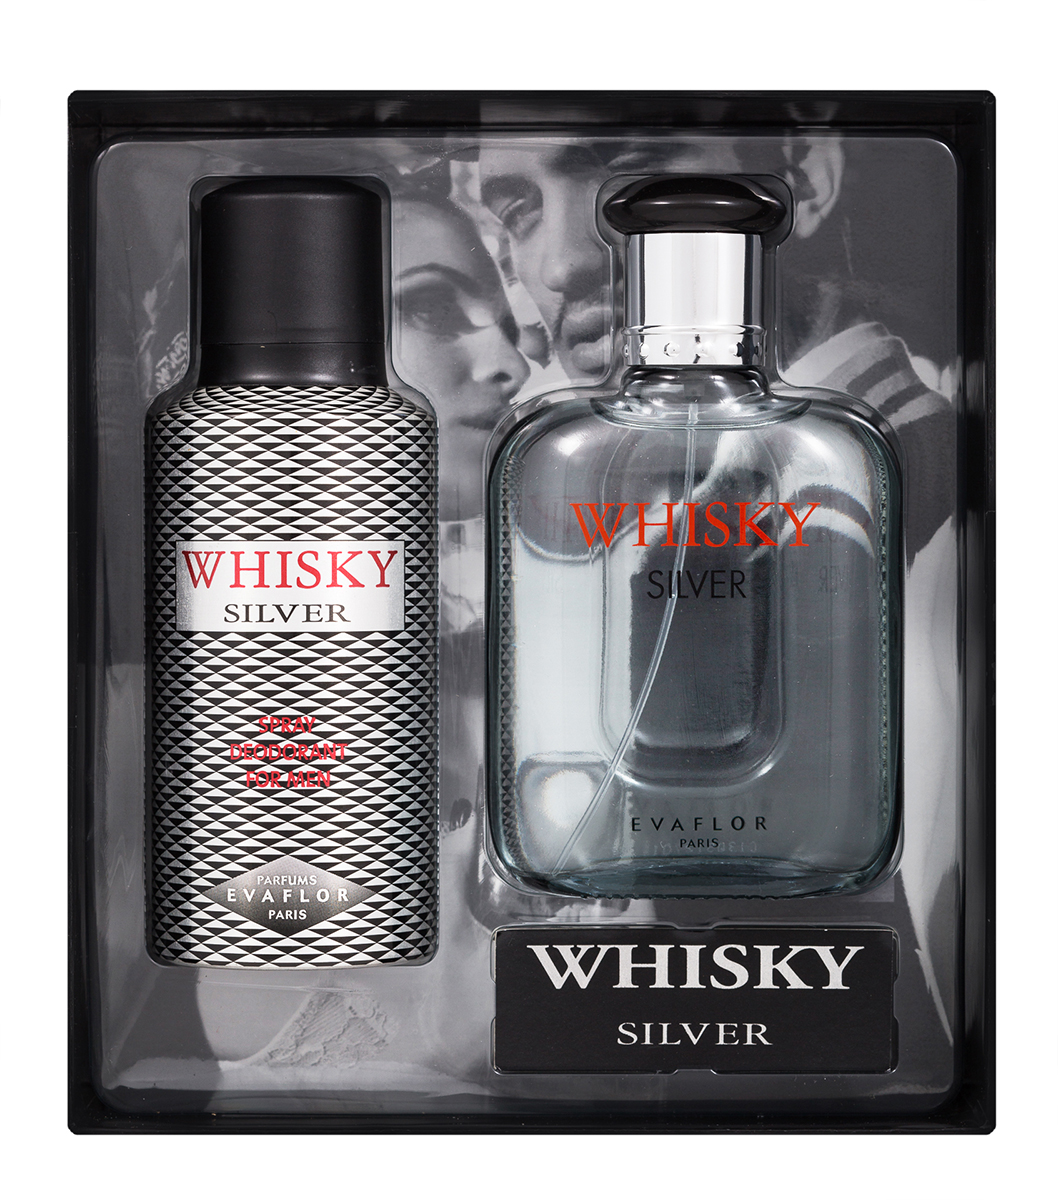 Evaflor Подарочный набор Whisky Silver мужской: Туалетная вода,100 мл , дезодорант, 150 мл42903Подарочный набор для мужчин : туалетная вода 100мл, парфюмированный дезодорант 150 мл.